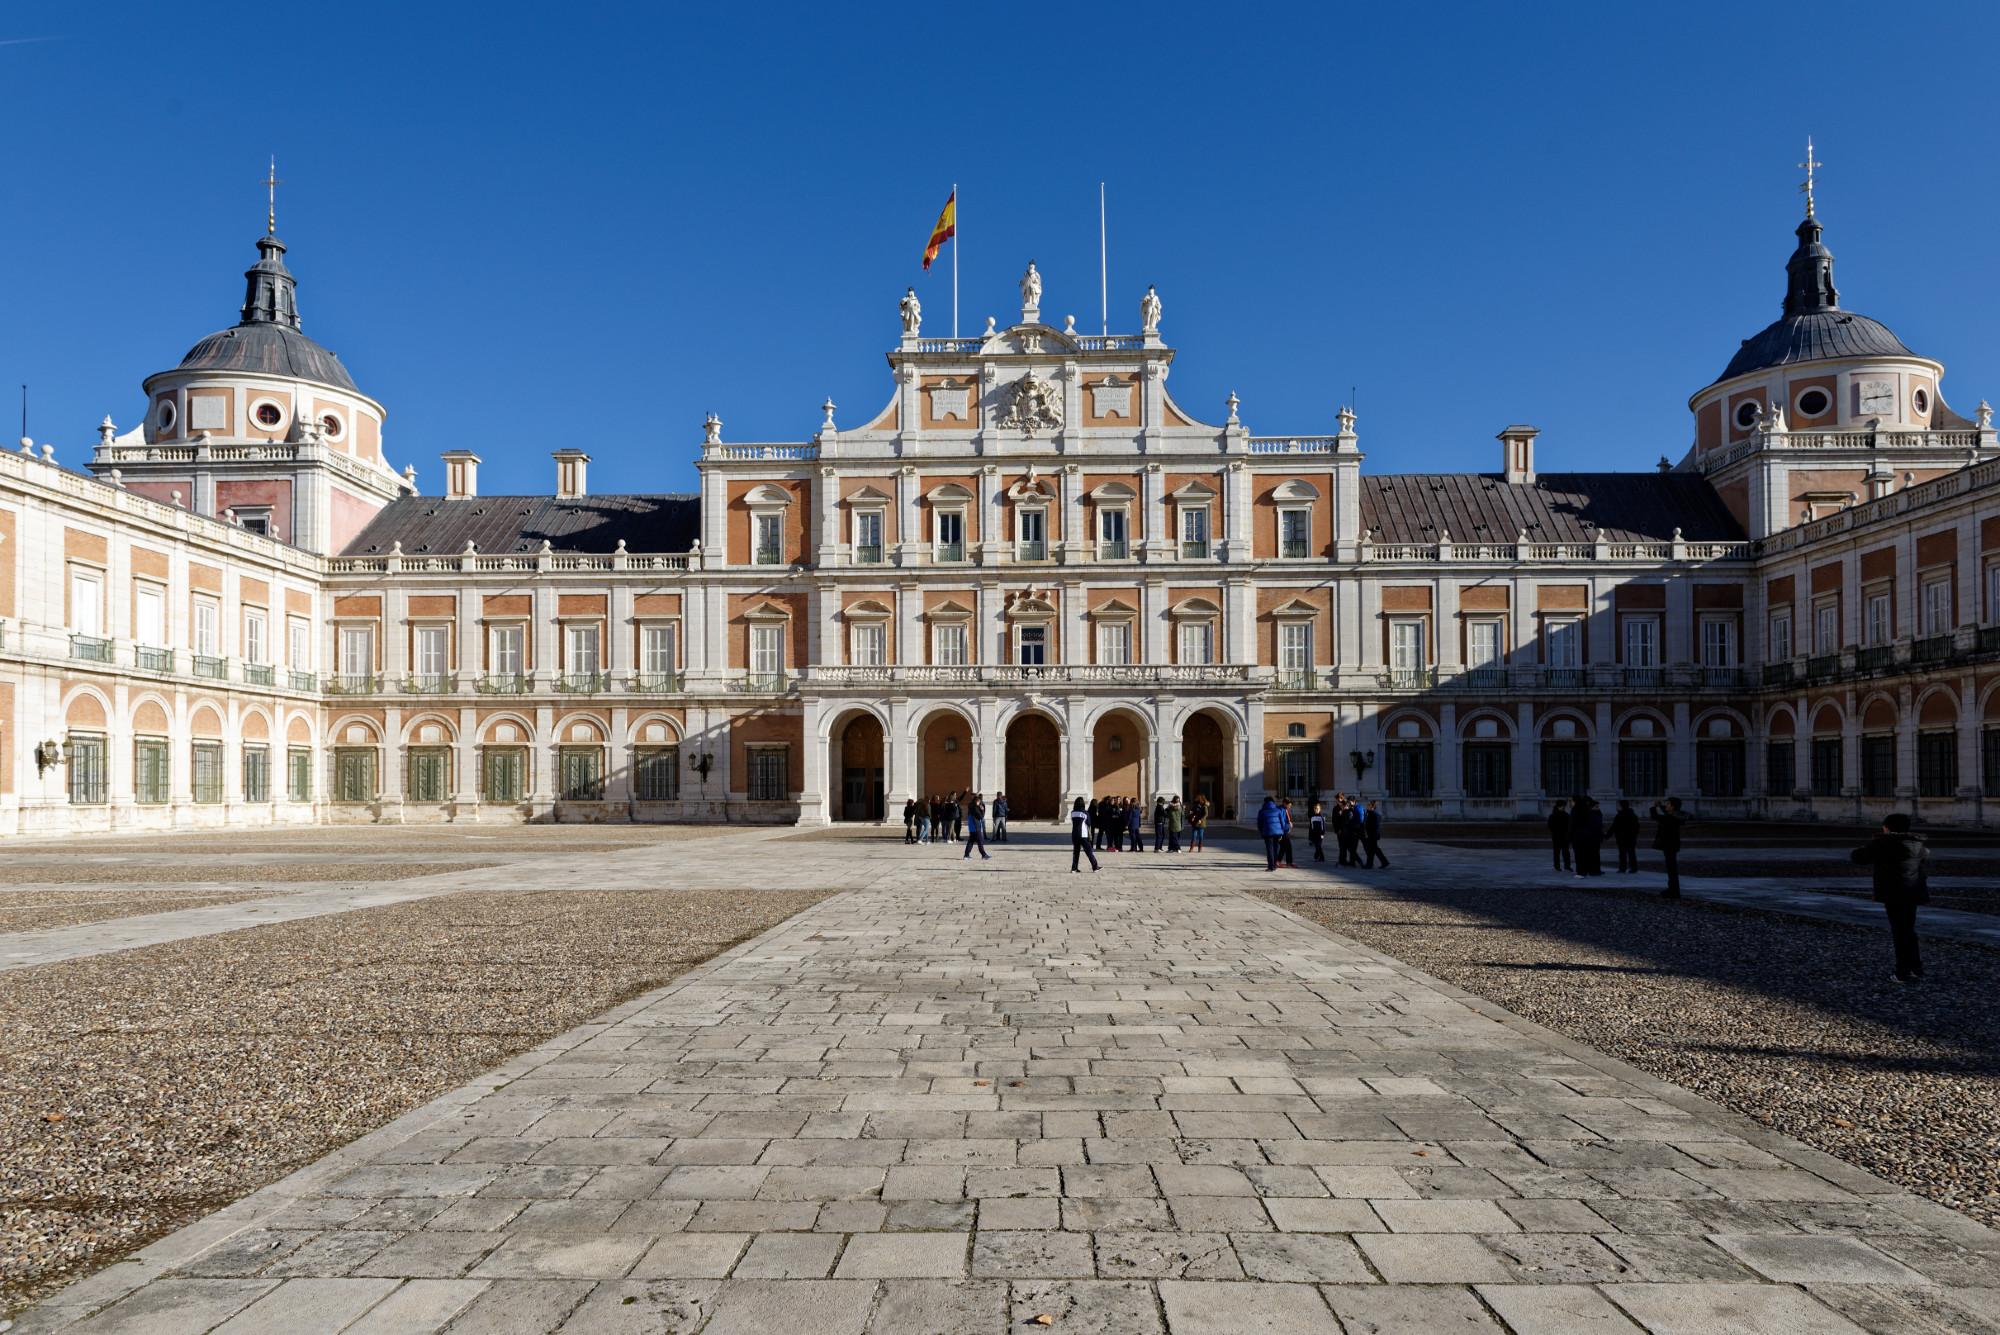 171221-Aranjuez (Castille) (30)